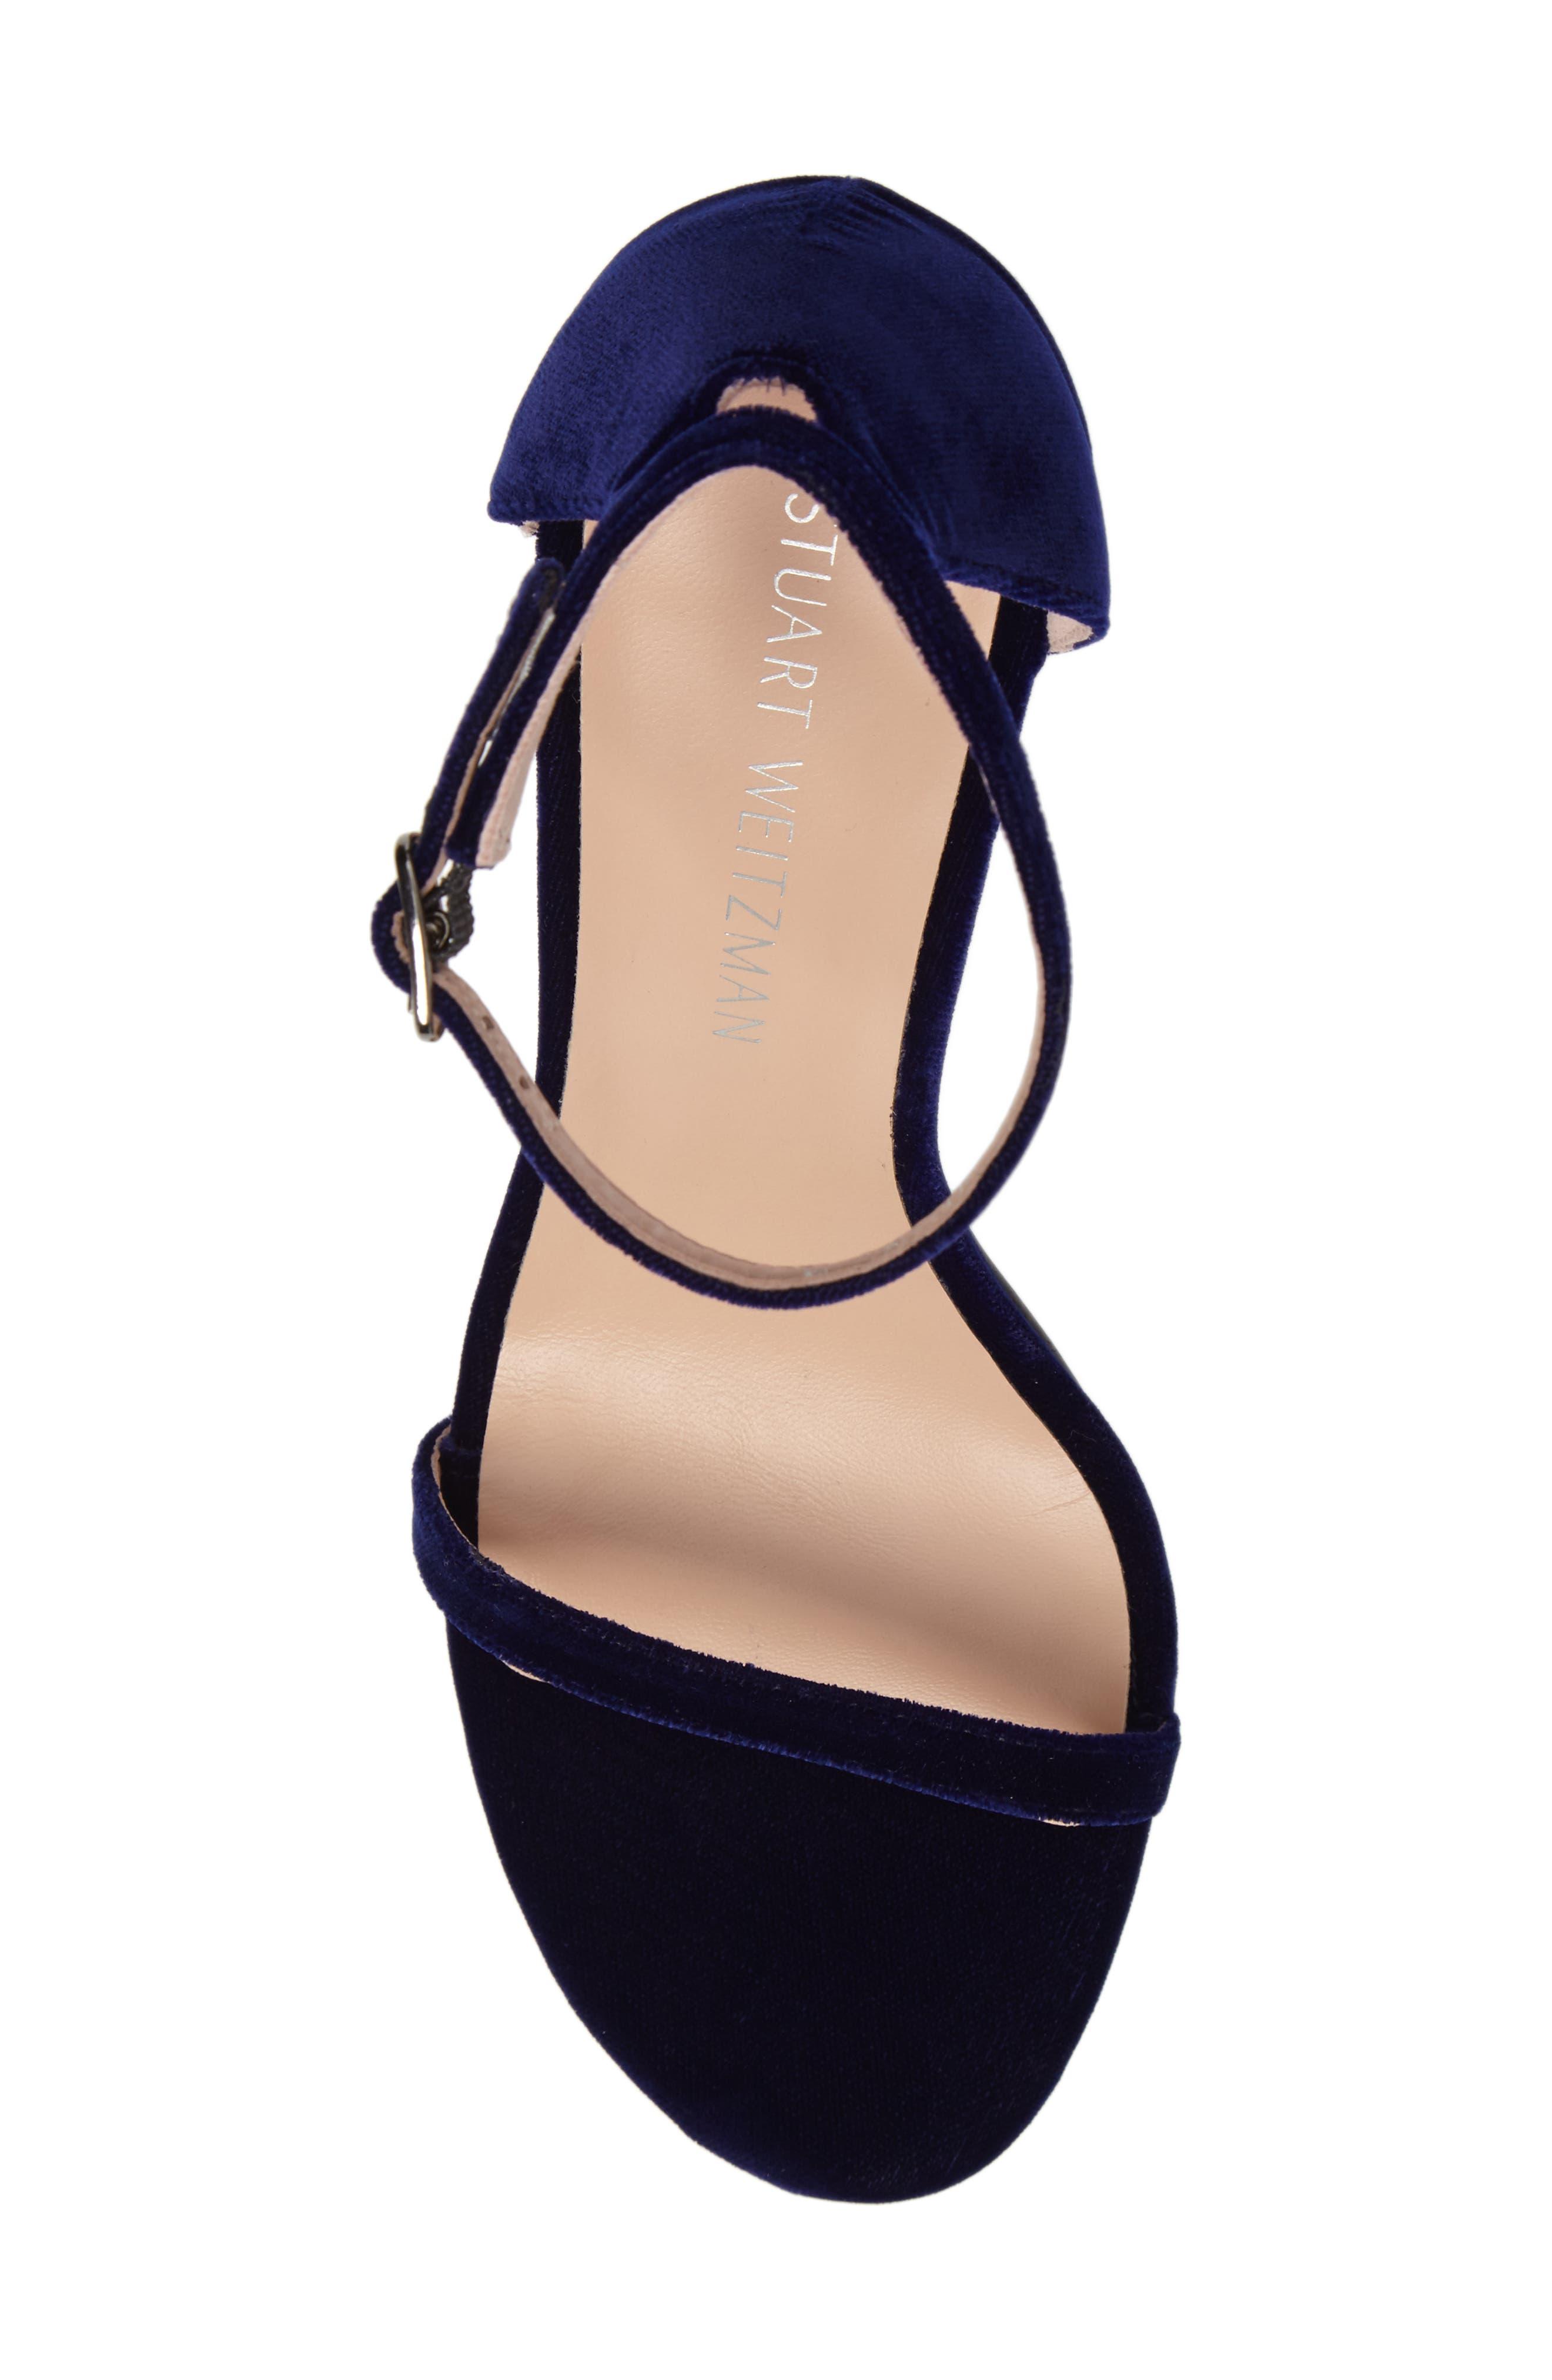 Nudistsong Ankle Strap Sandal,                             Alternate thumbnail 197, color,